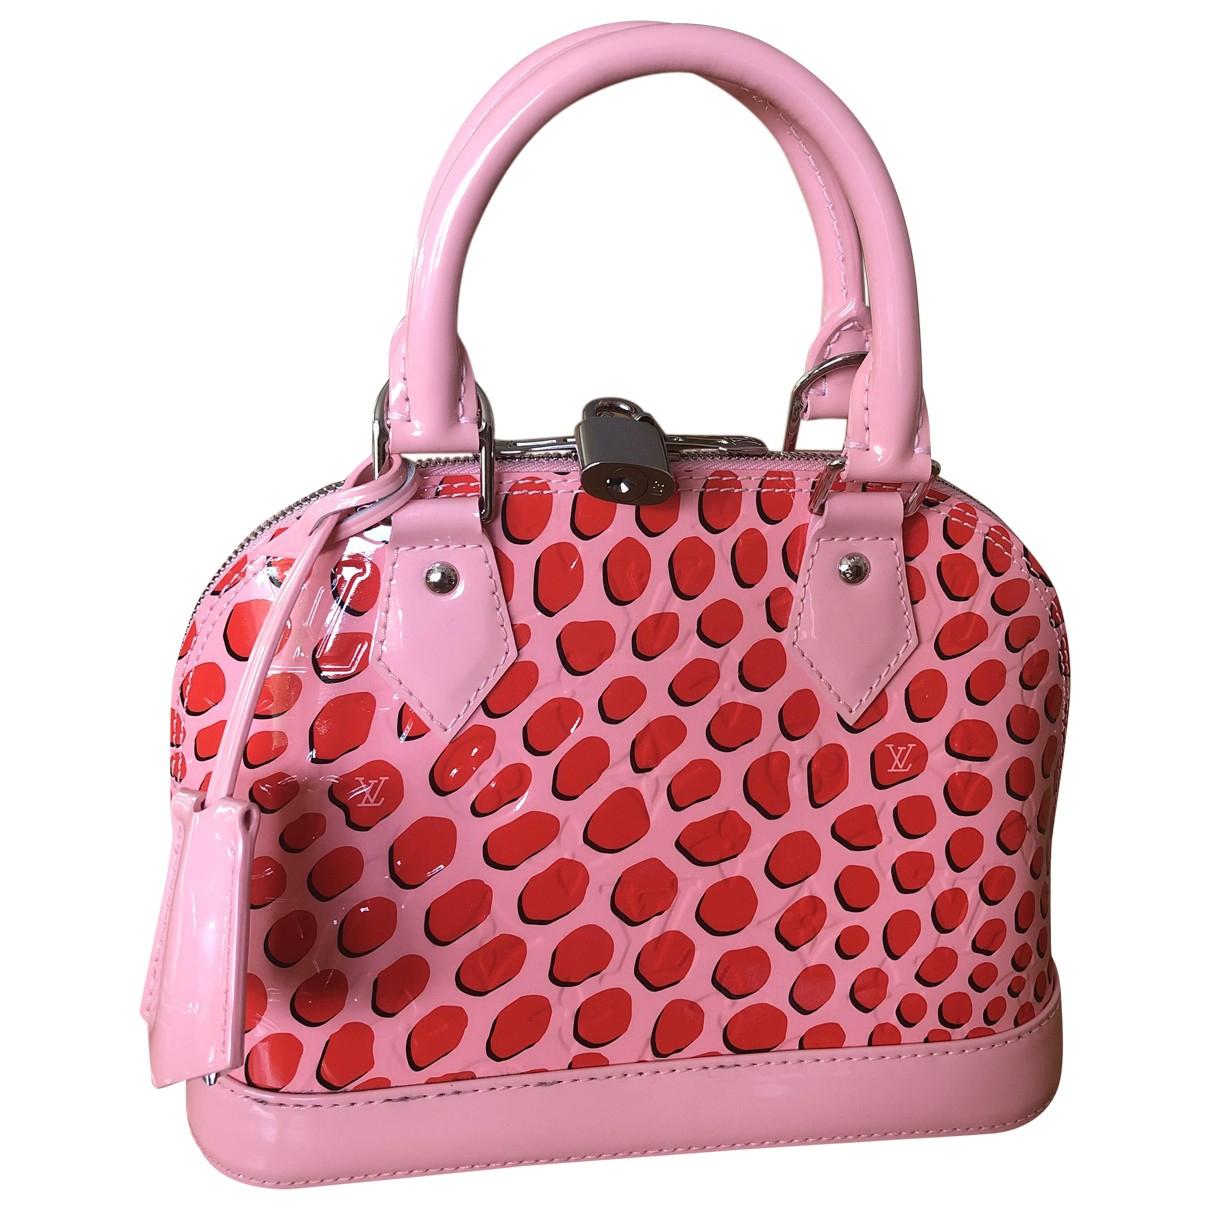 Louis Vuitton Alma BB Handtasche in  Rosa Lackleder